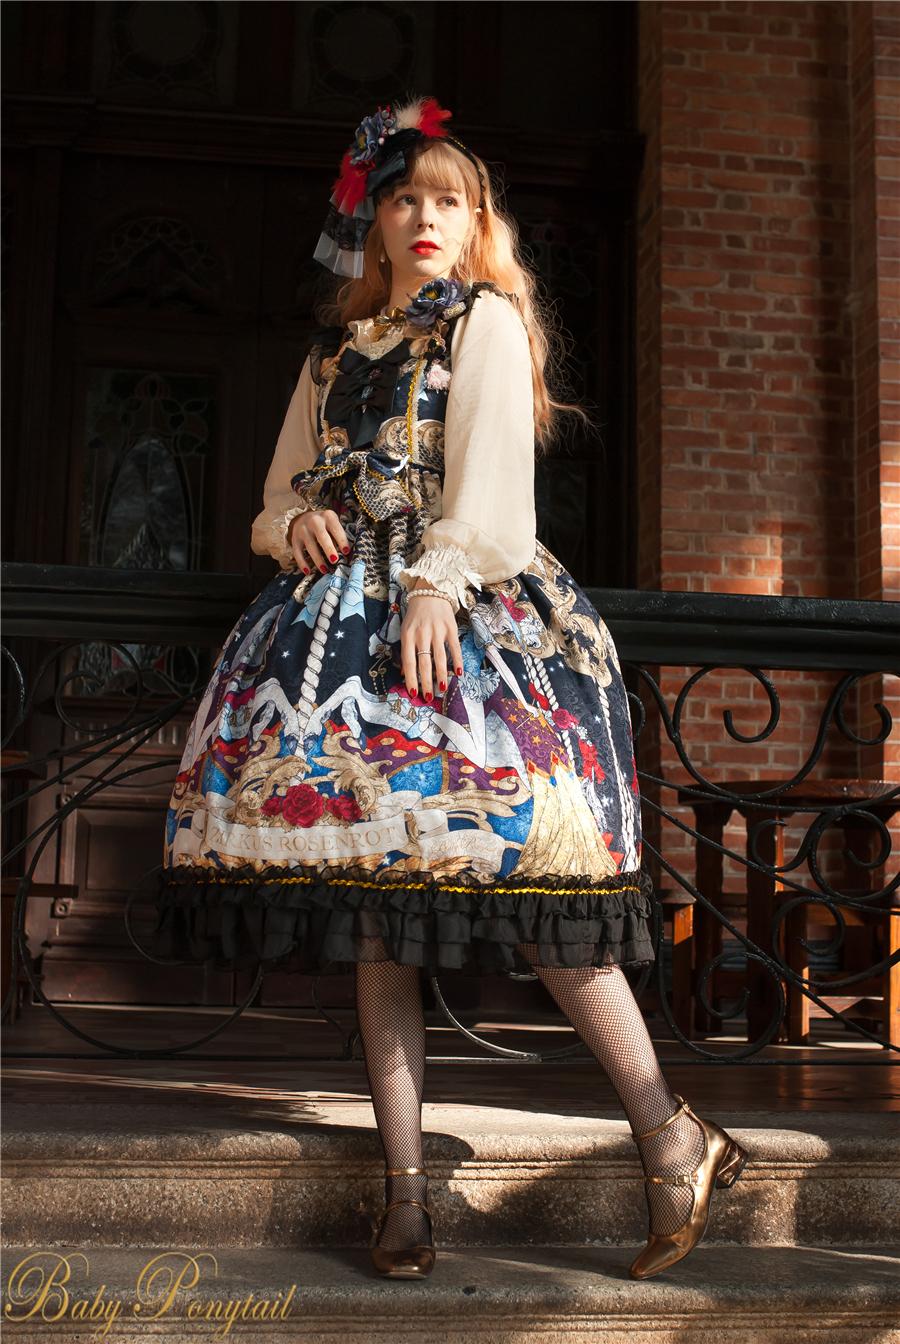 Baby Ponytail_Circus Princess_Black JSK_Claudia_07.jpg